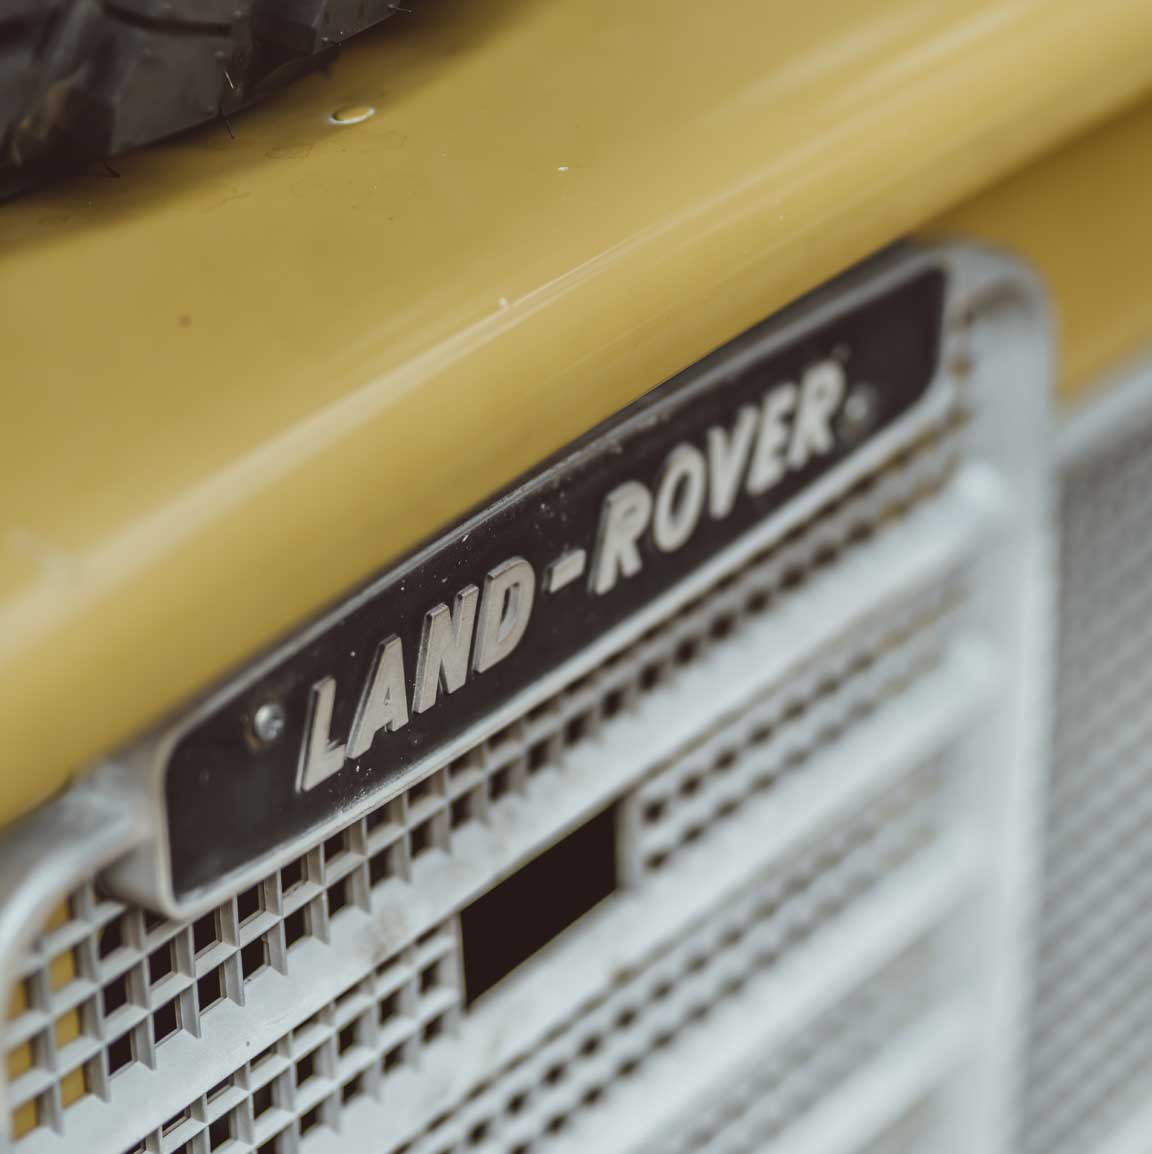 1975_Land_Rover_Series_III_109_Bahama_Gold_Small_0011_Layer 59.jpg